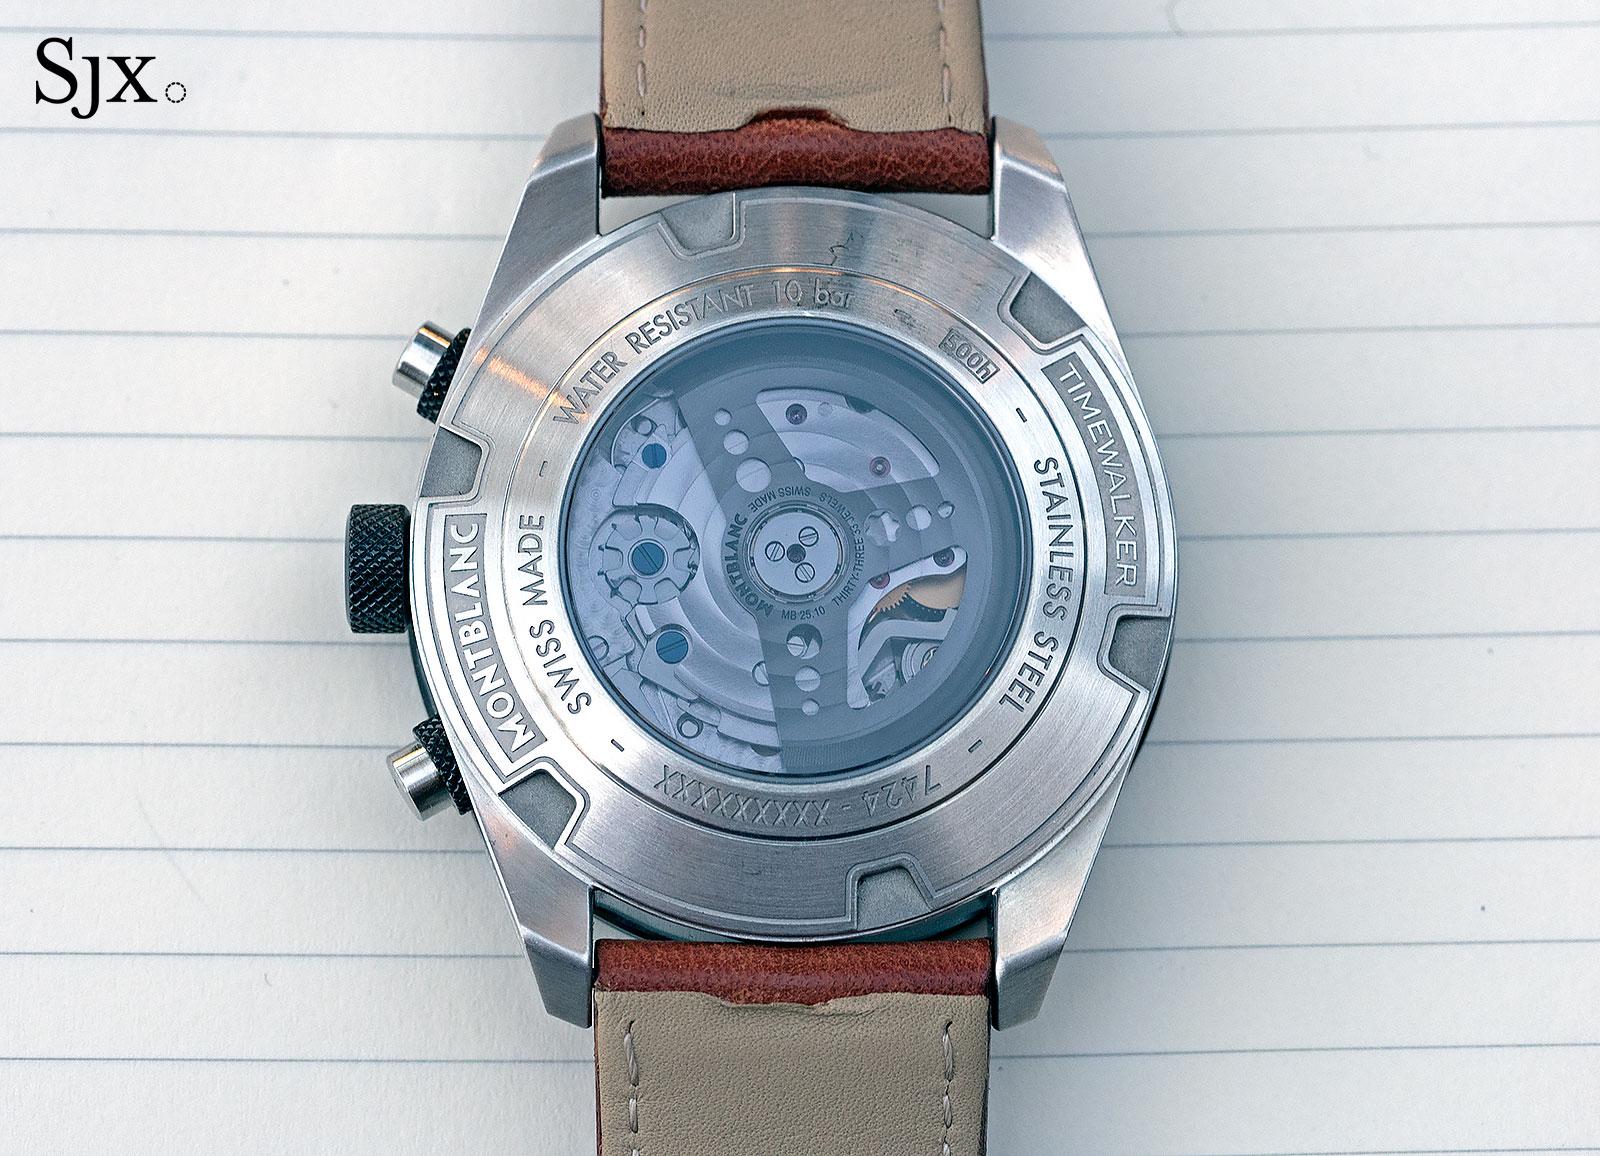 Montblanc Montblanc TimeWalker Manufacture Chronograph 8